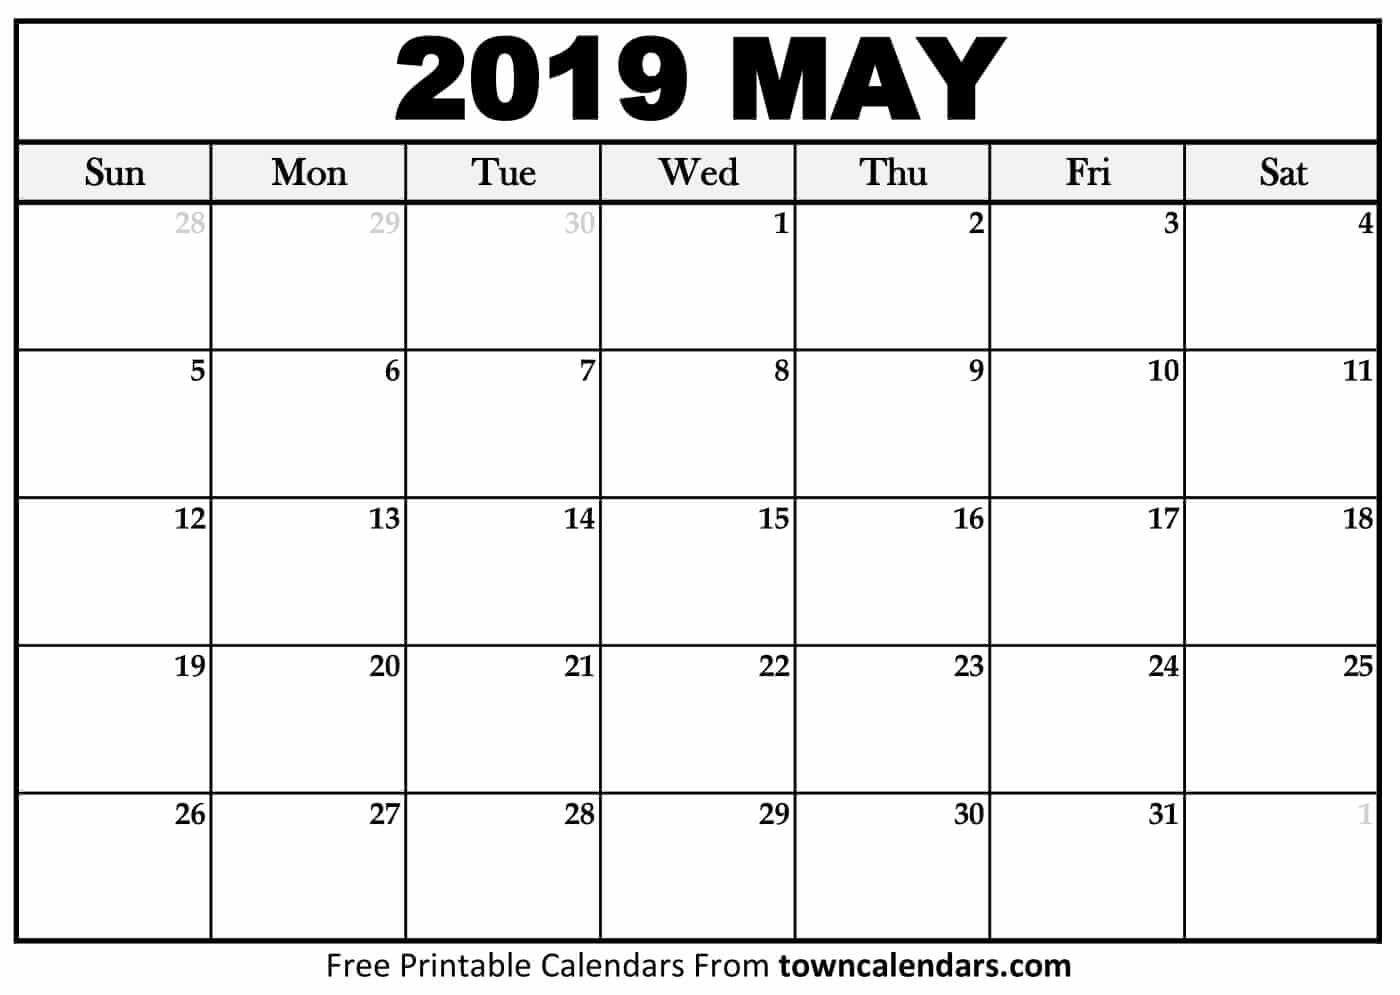 Printable May 2019 Calendar – Towncalendars May 4 2019 Calendar